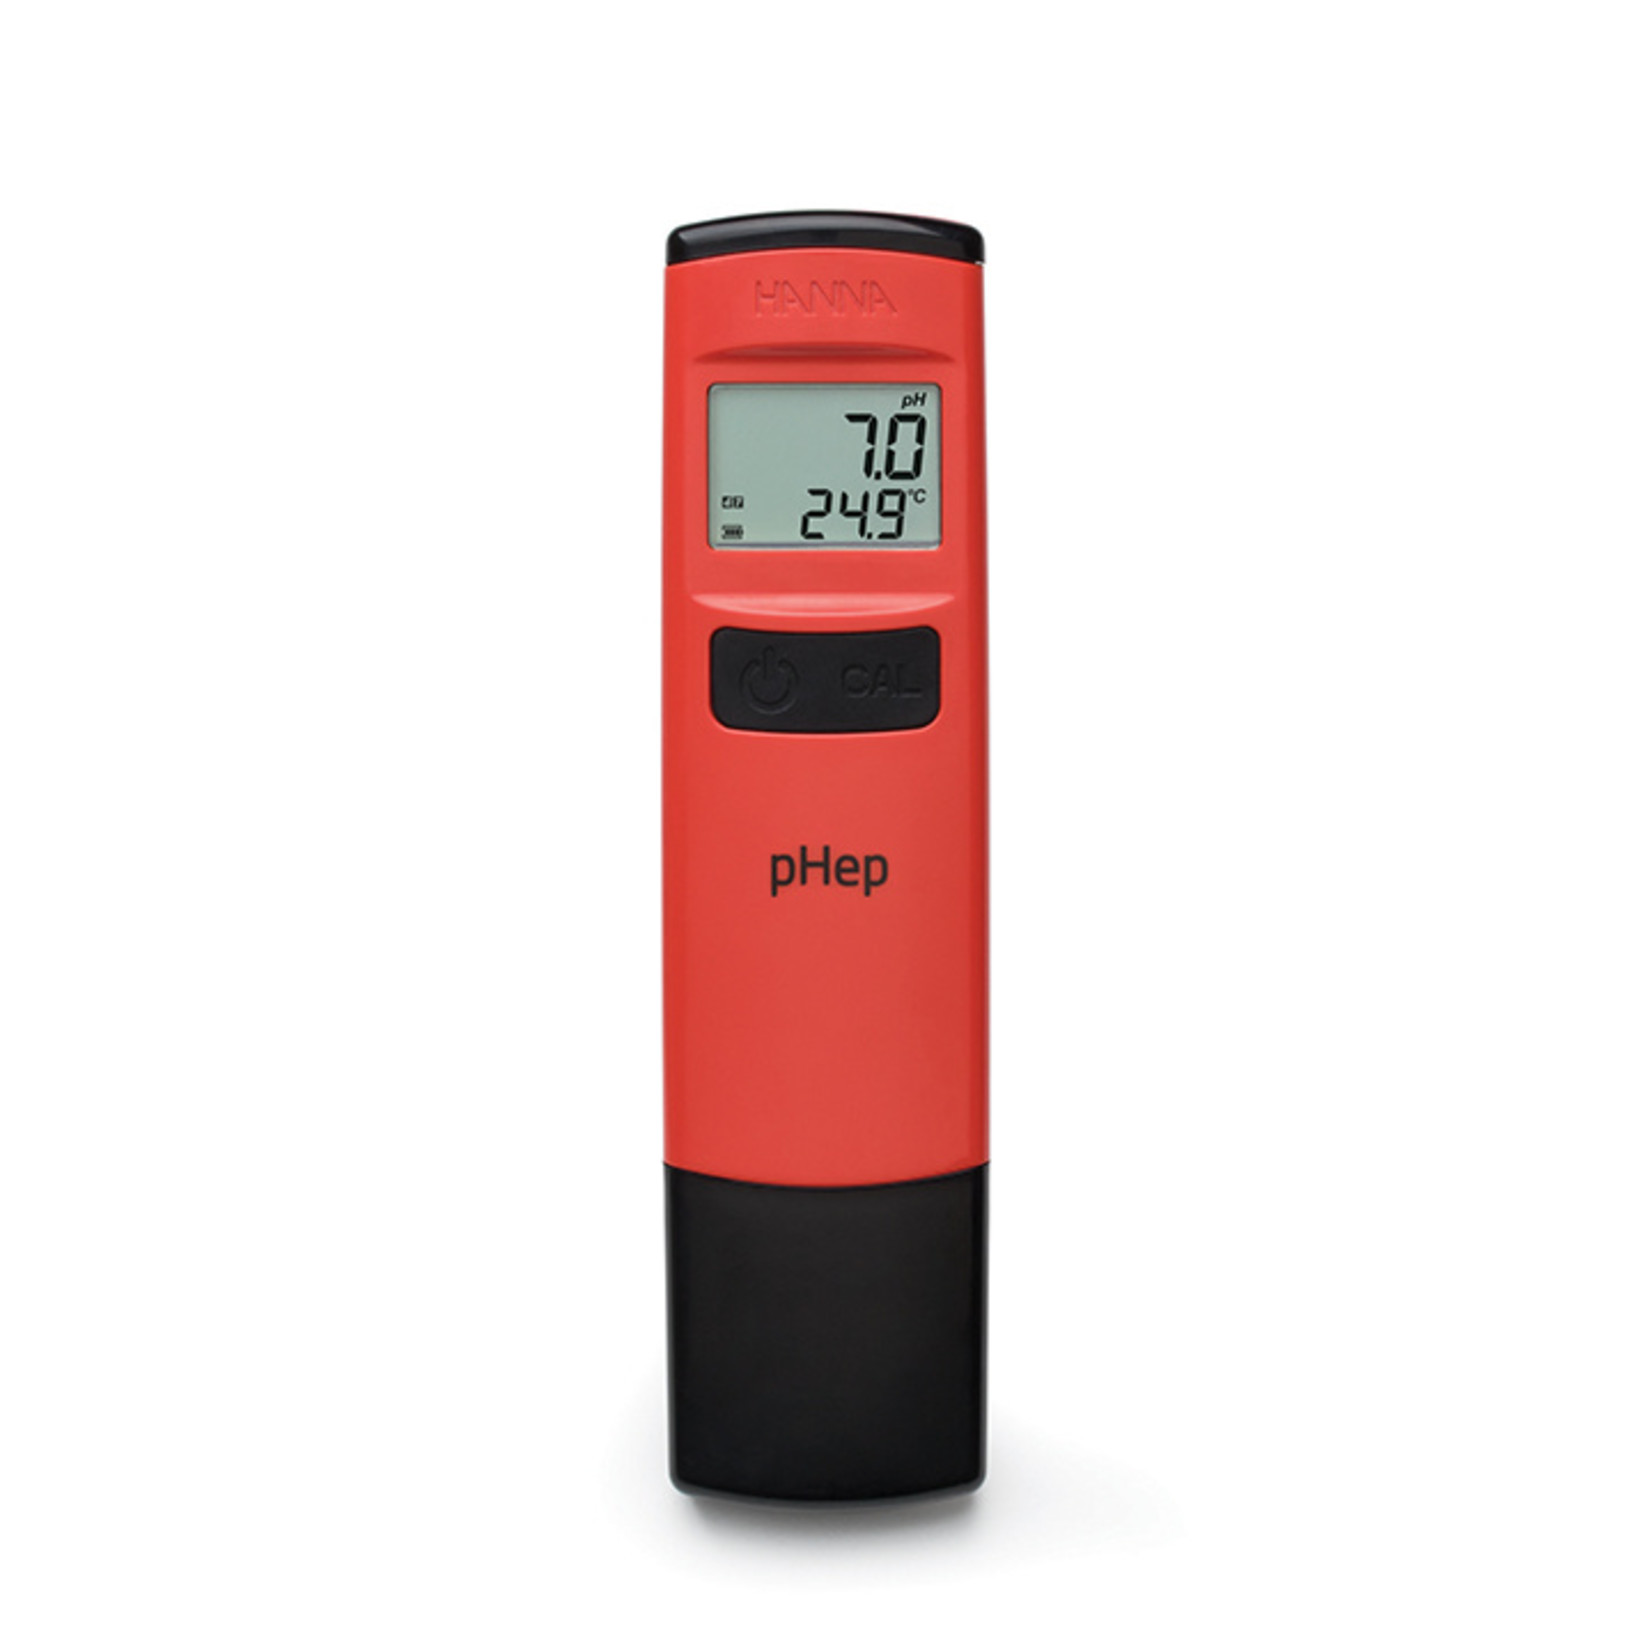 Hanna Instruments HI98107 Checker pHep waterproof